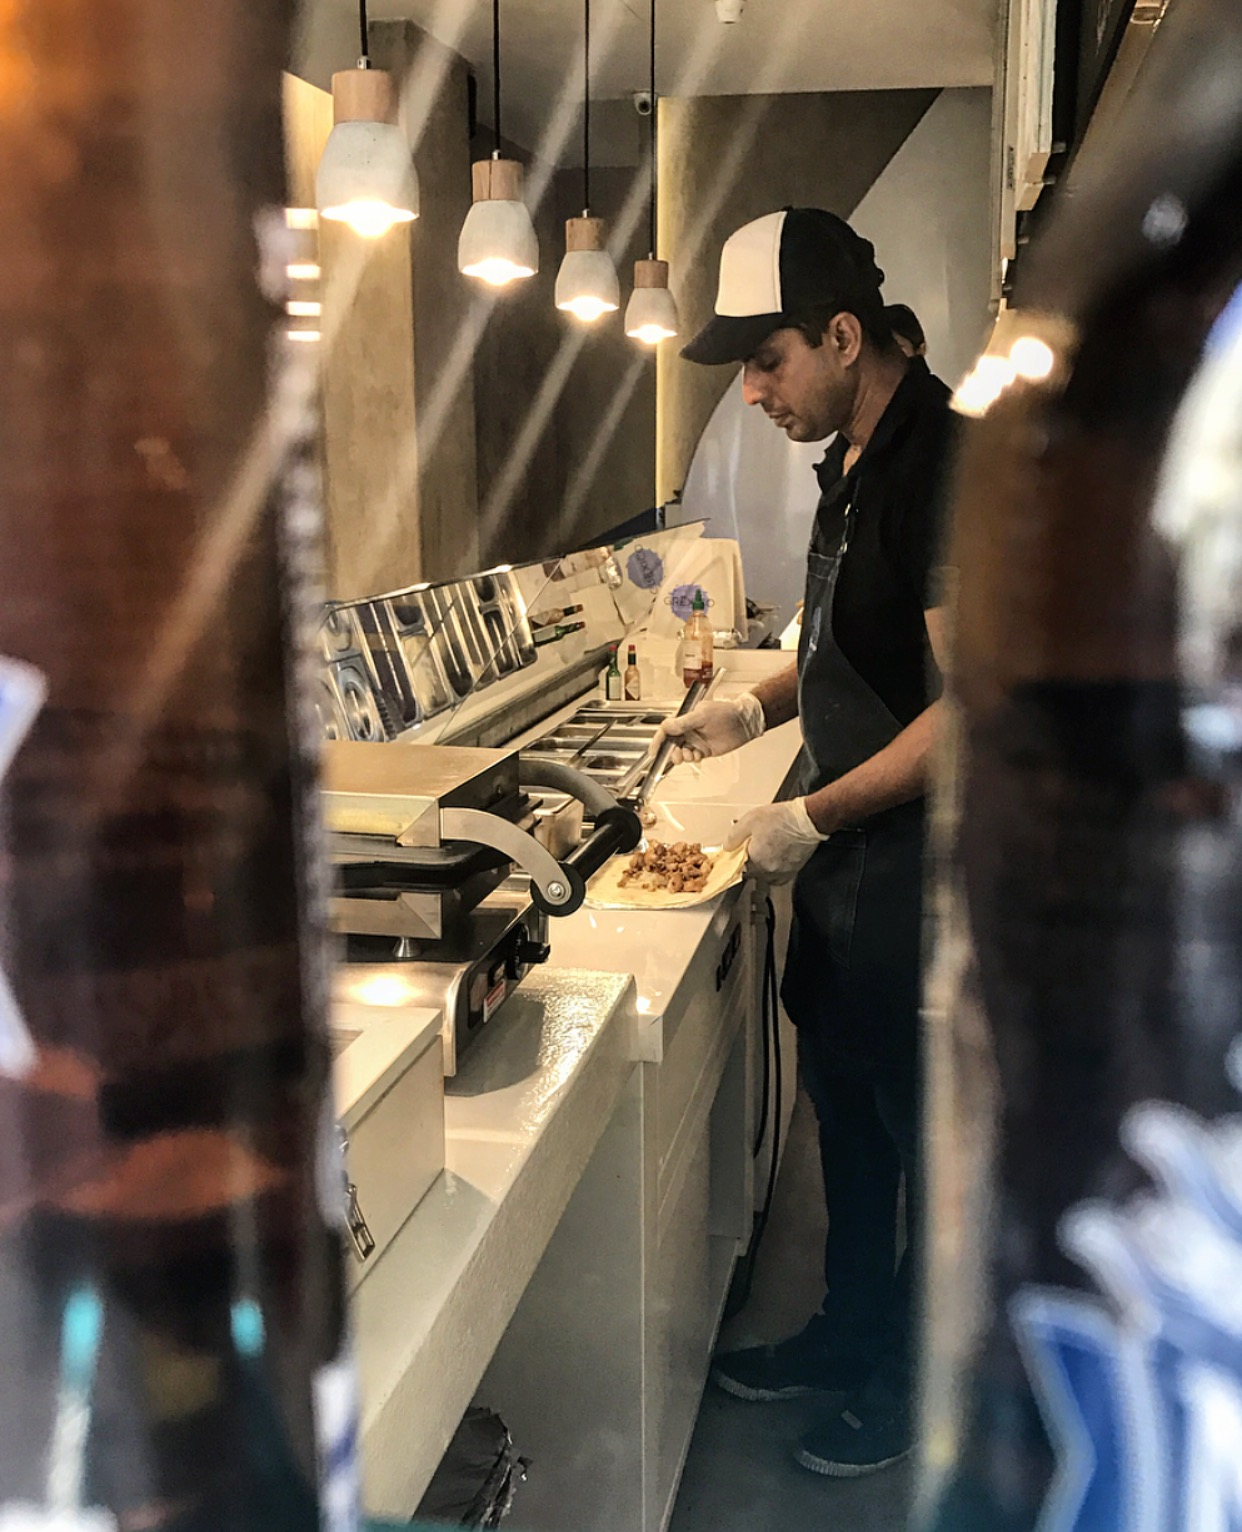 Grexico: Το μεξικάνικο street food όπως δεν το έχεις φανταστεί... Tώρα στο κέντρο της Αθήνας!